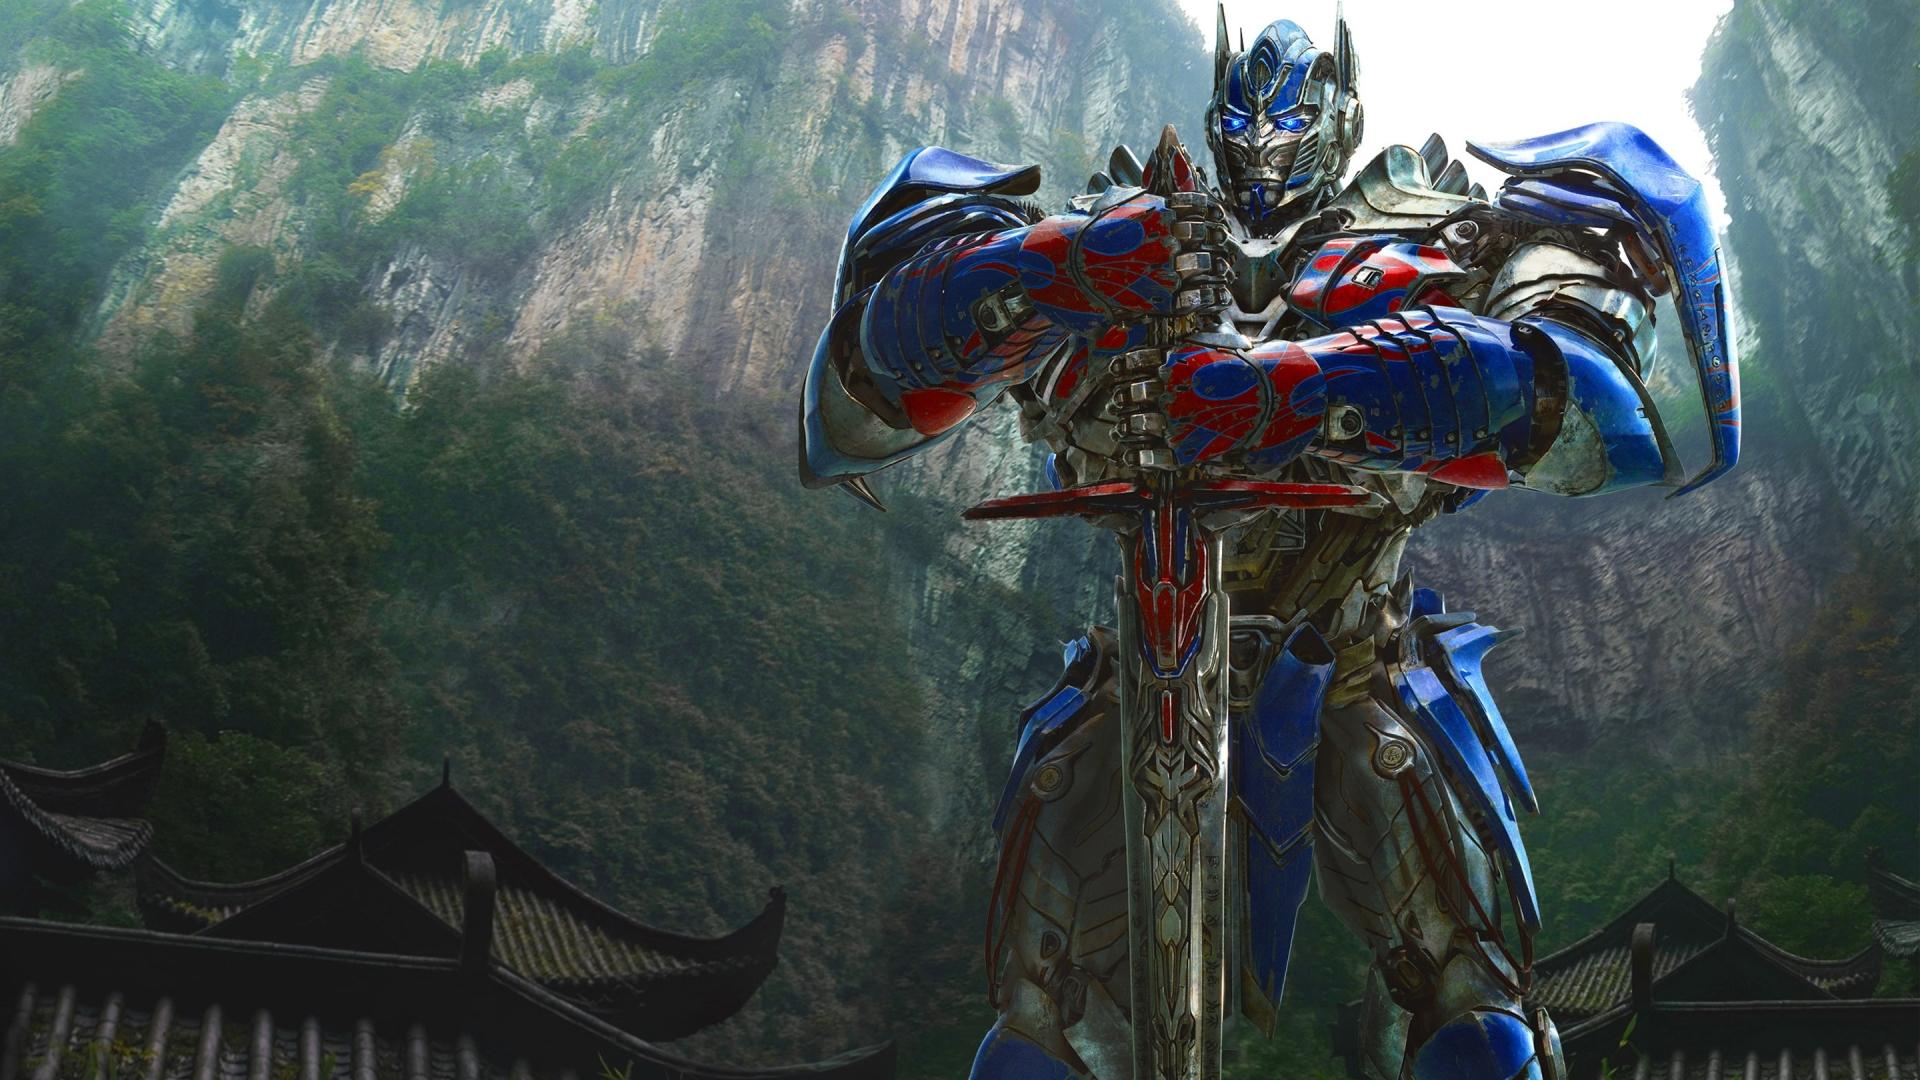 Samsung Galaxy S5 Wallpaper: Optimus Prime In Transformers, Full HD 2K Wallpaper